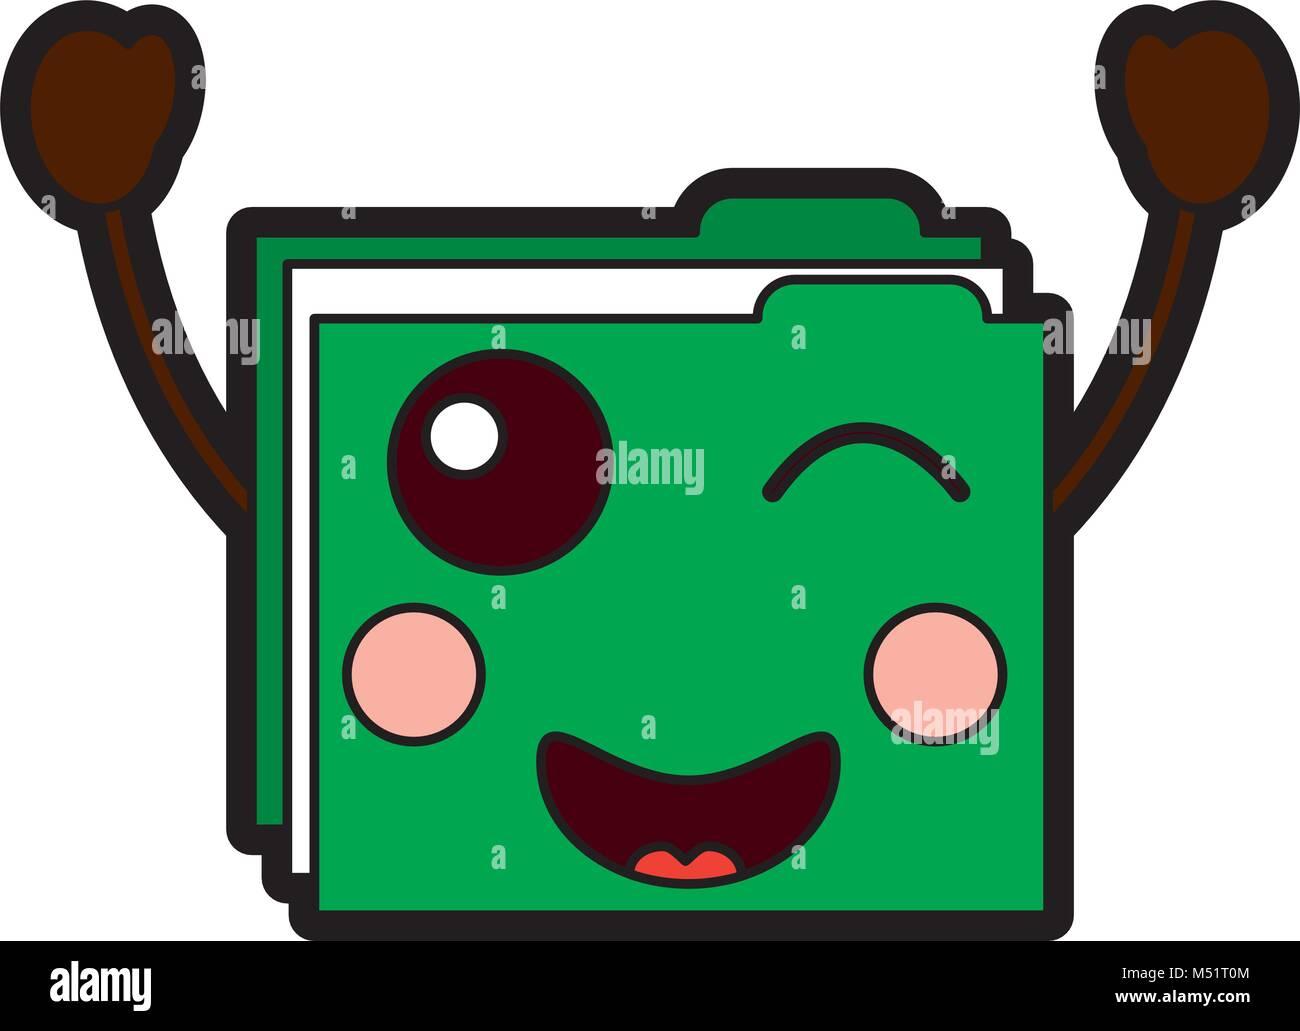 7bd9081523 Emoji Wink Expression Image Immagini & Emoji Wink Expression Image ...